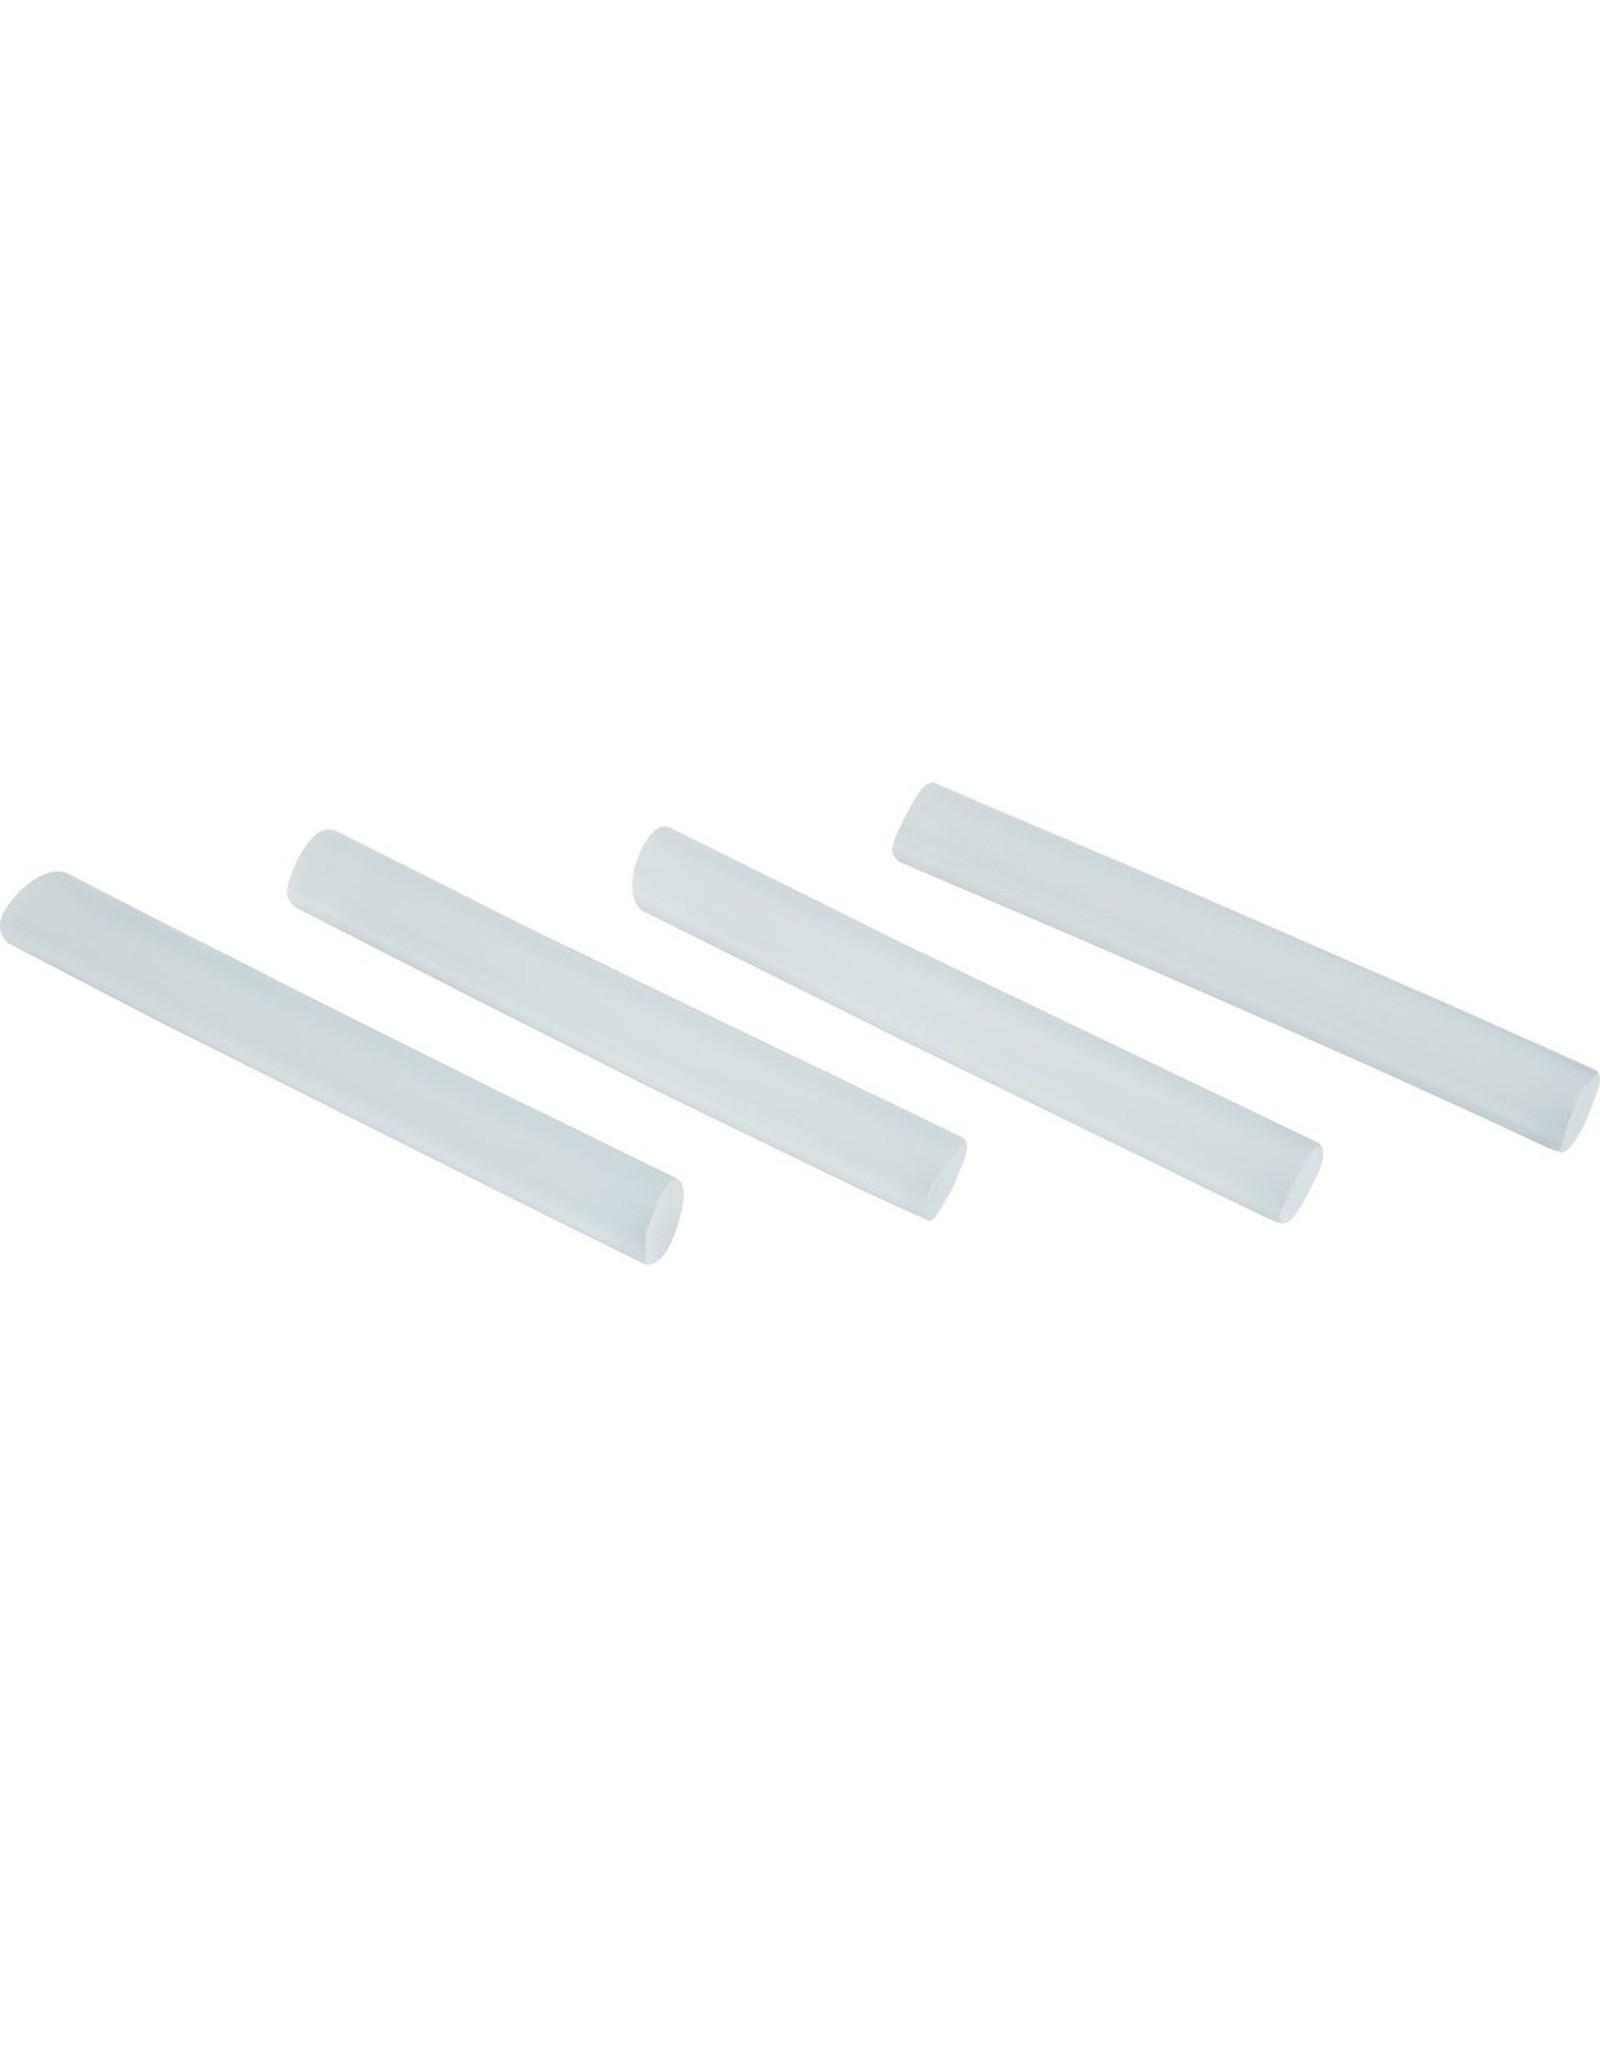 Swix T0176 Glue Stick 1 ea